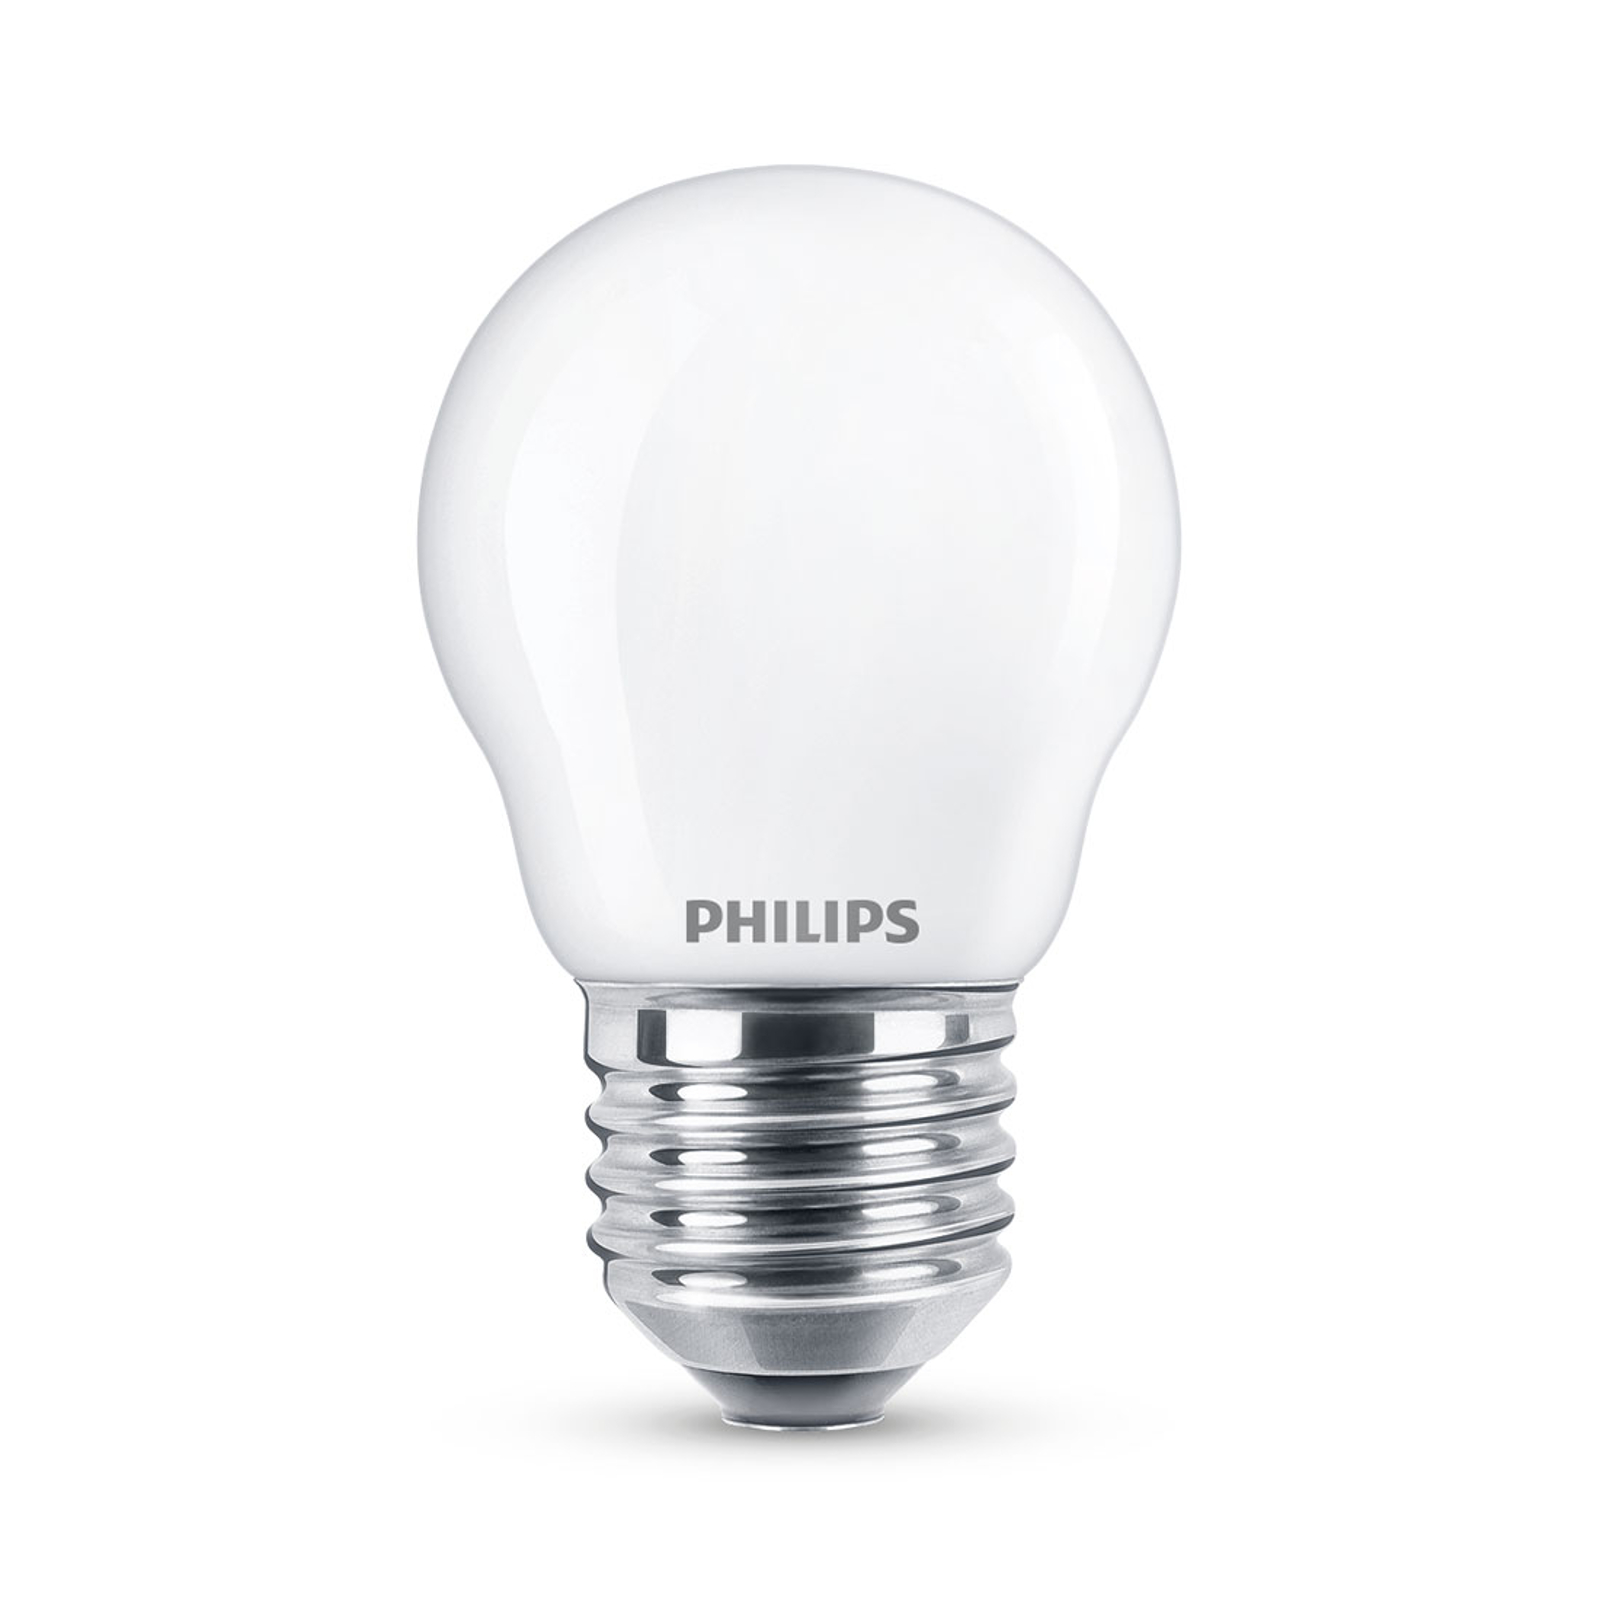 Philips Classic żarówka LED E27 P45 6,5W 2700K mat